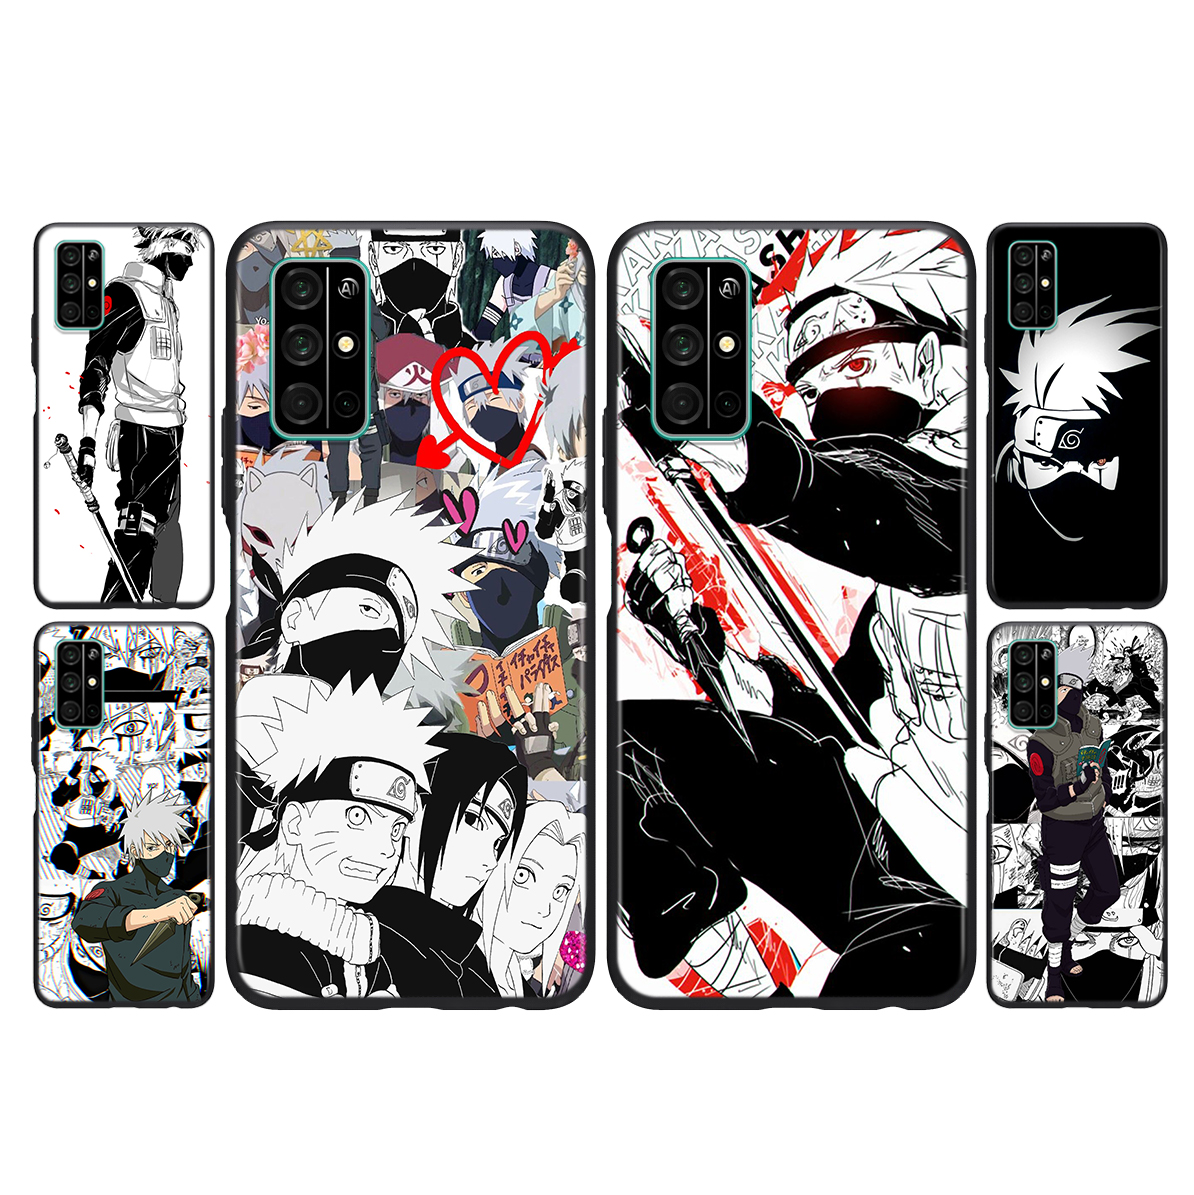 Silicone Cover Hatake Kakashi For Huawei Honor 30i 10X 30S 9A 9S 9X 30 9C 20 20S V20 10i 10 7C Pro Lite Phone Case